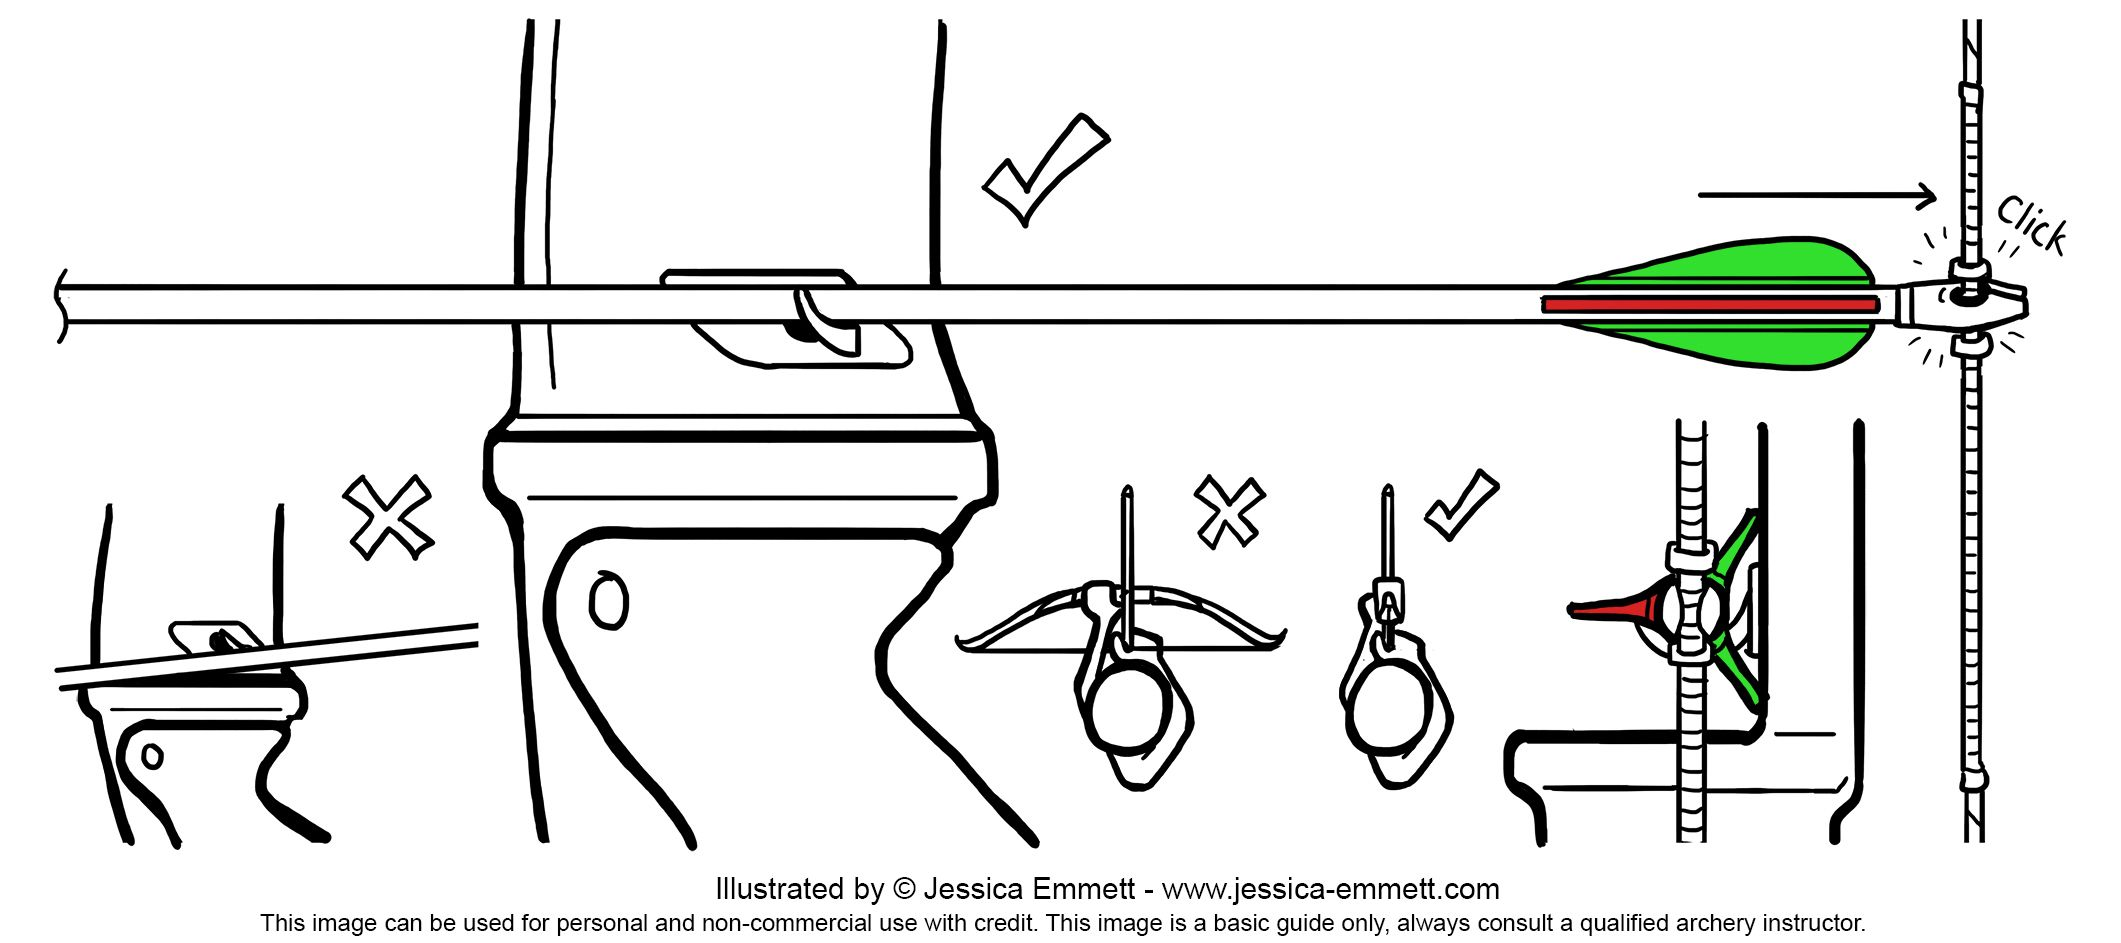 Beginners Recurve Nock Arrow Guide 2 121 943 Pixels